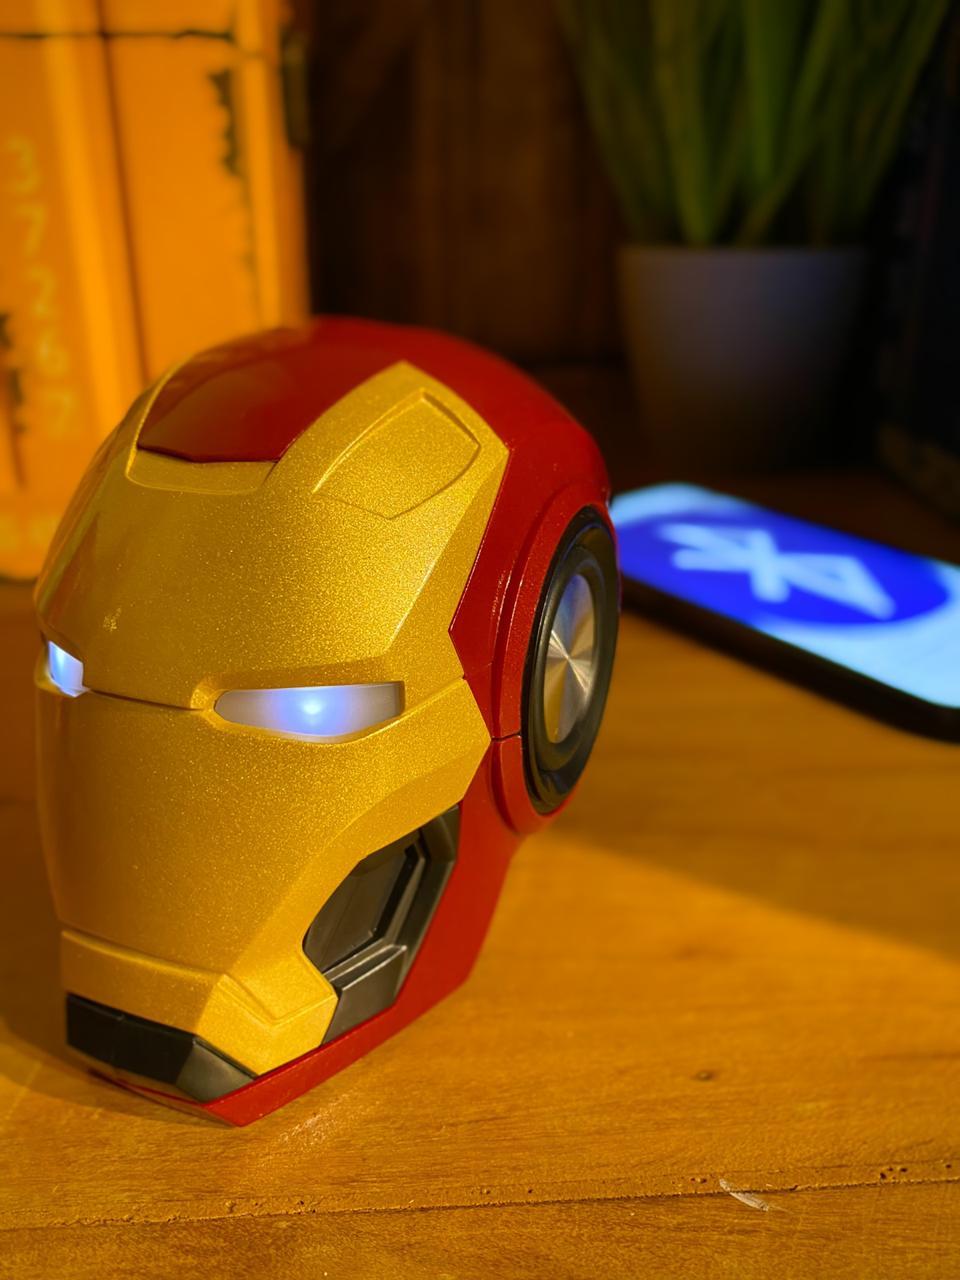 Caixa De Som Multifuncional Bluetooth Wireless Speaker: Homem De Ferro